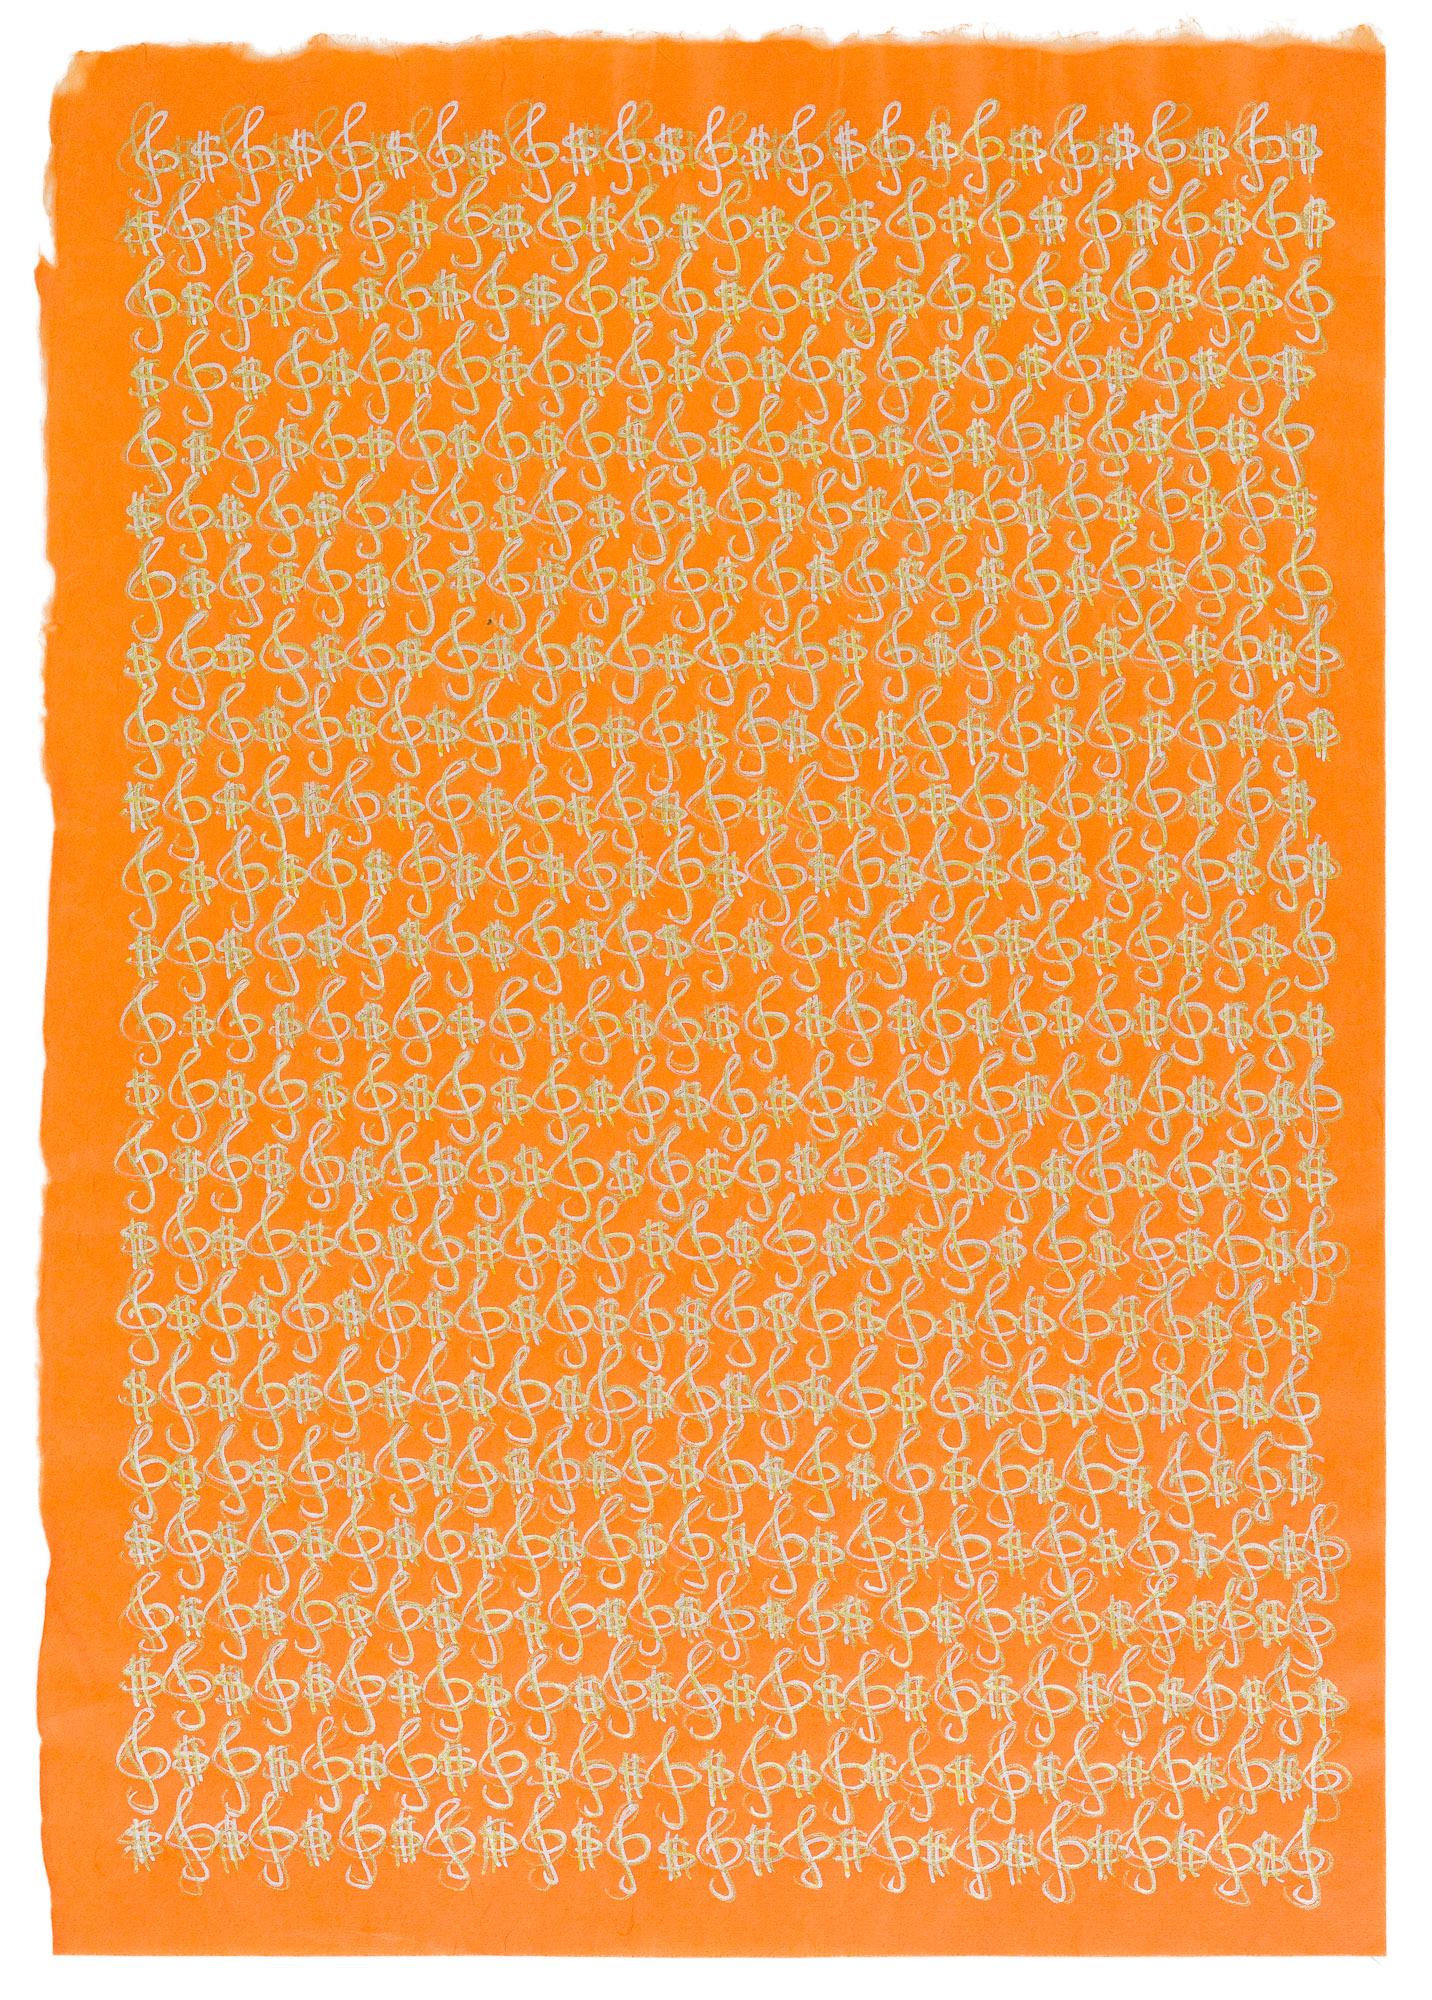 "Ana Prvacki, ""Various keys,"" 2014, Gel pen on Gampi paper, 15.9 x 12.5 inches (framed)"